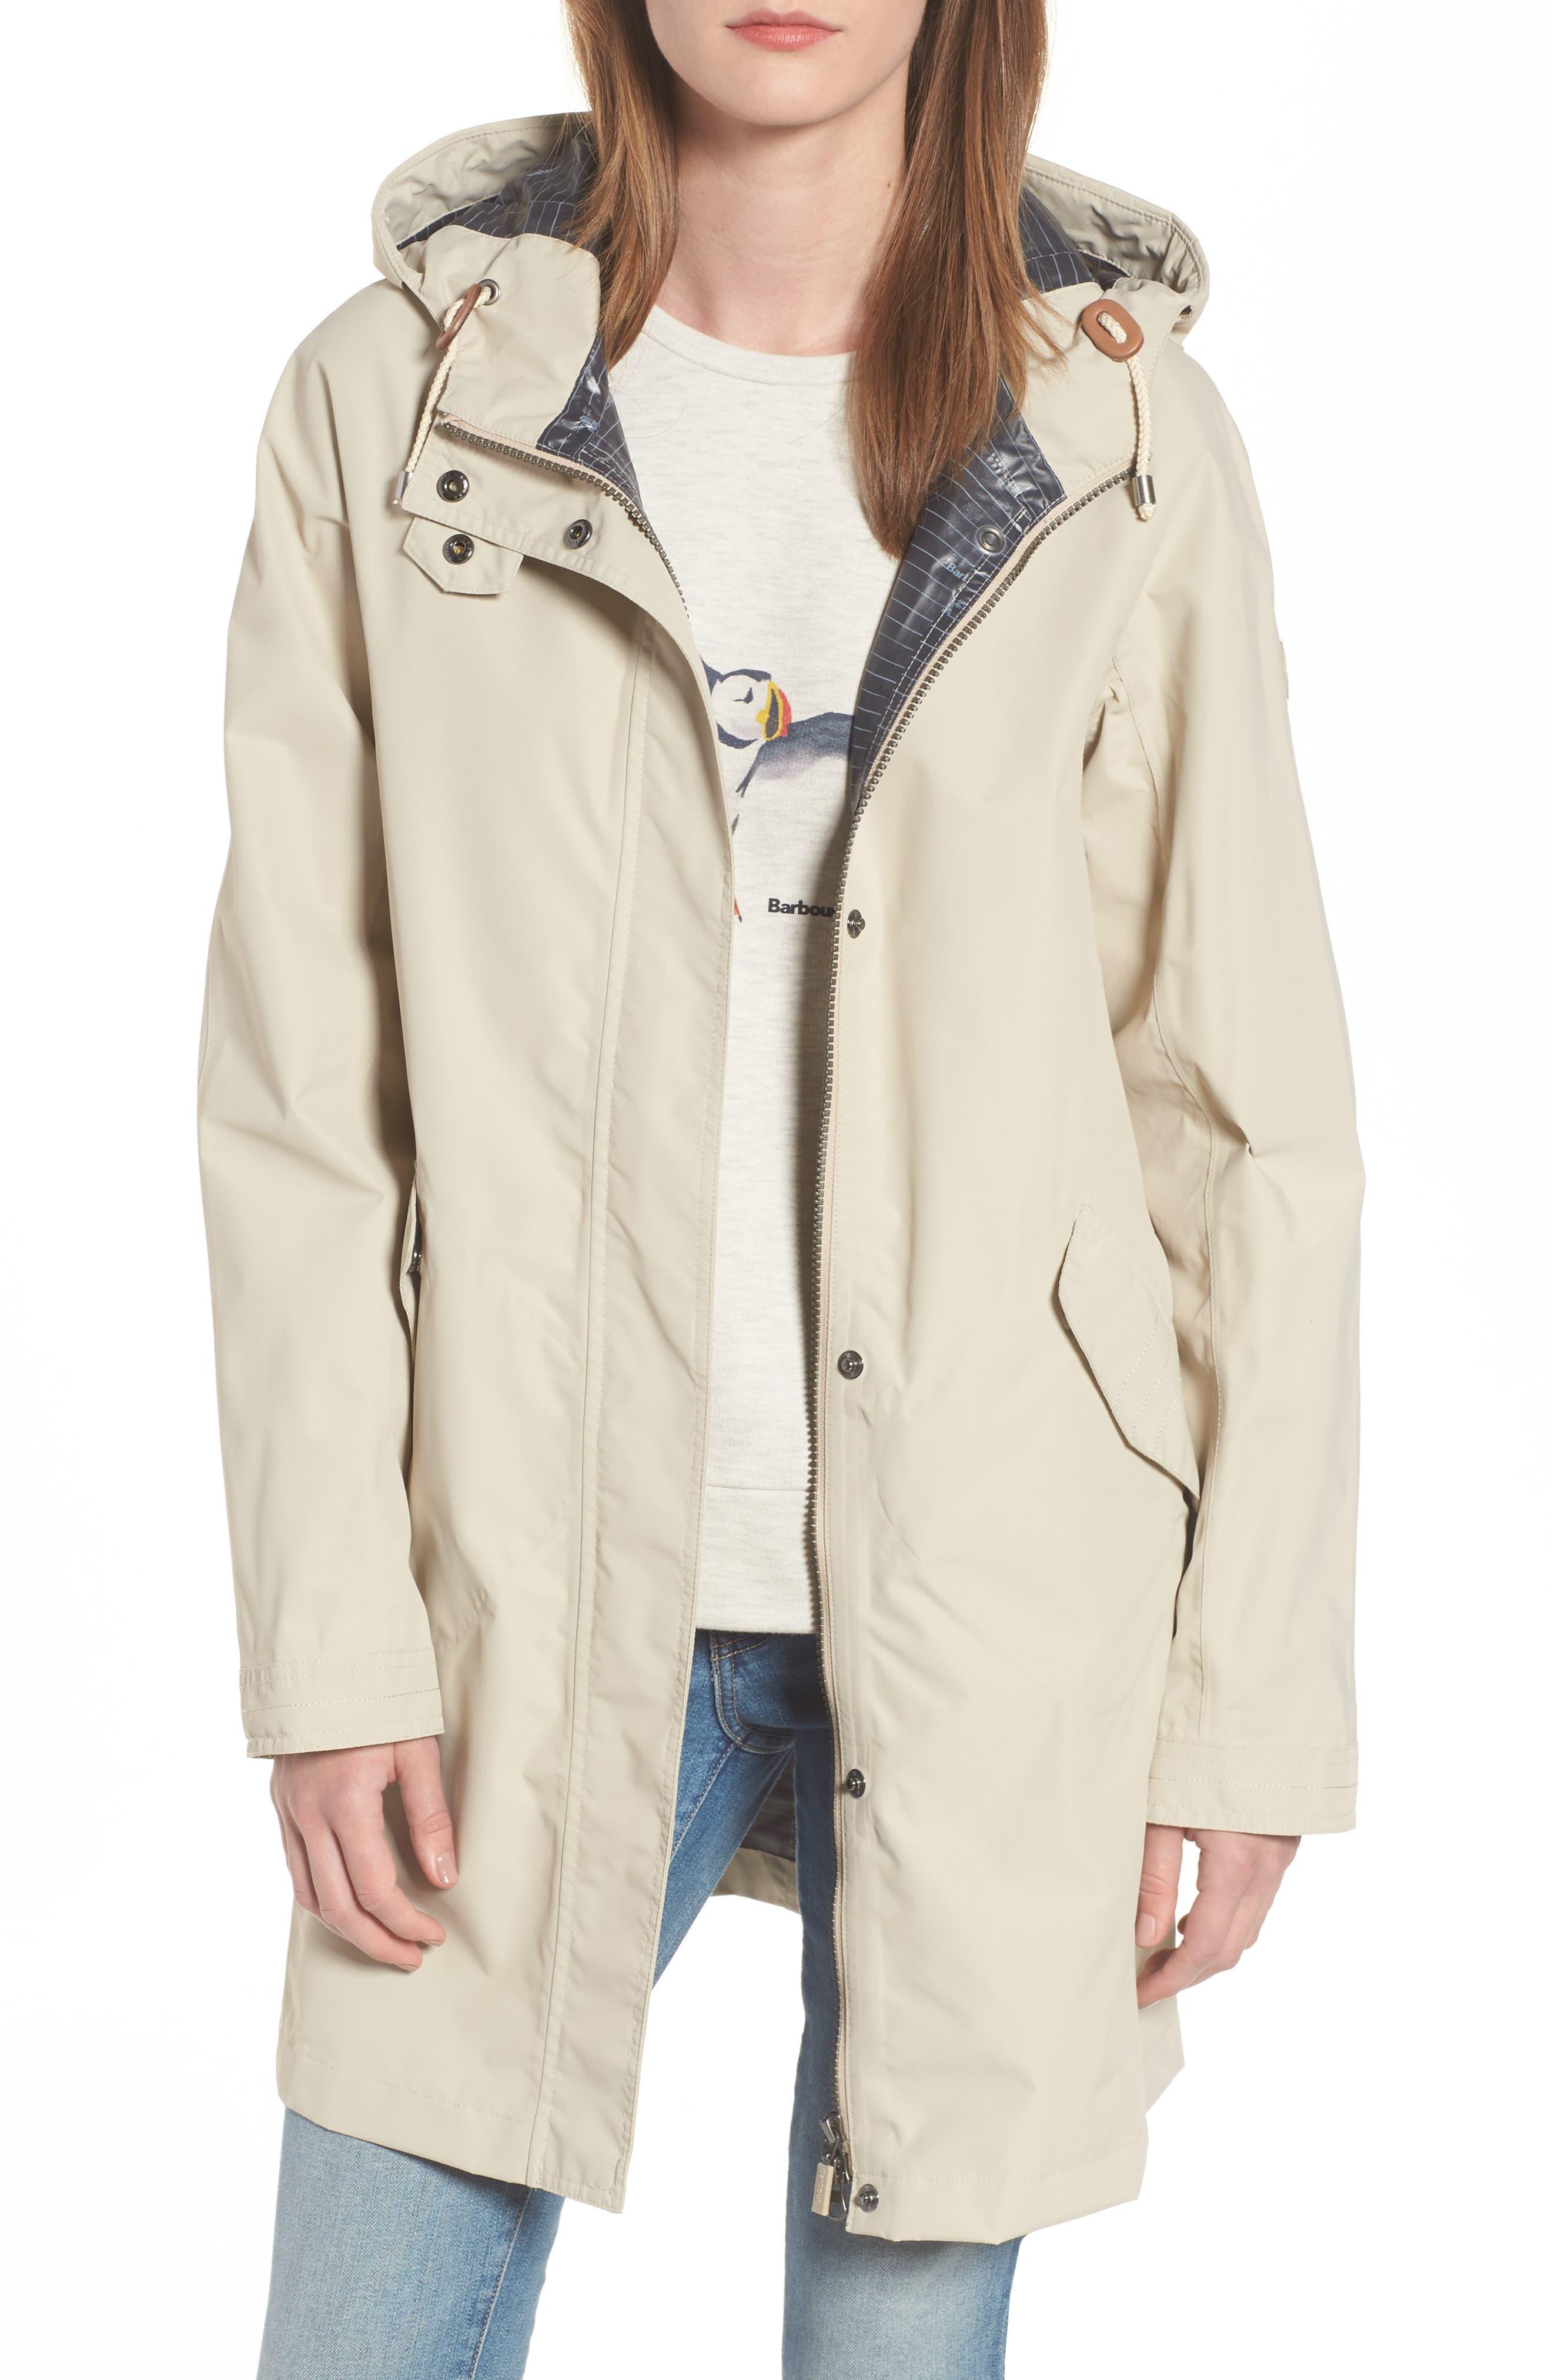 Barbour Hartland Hooded Jacket